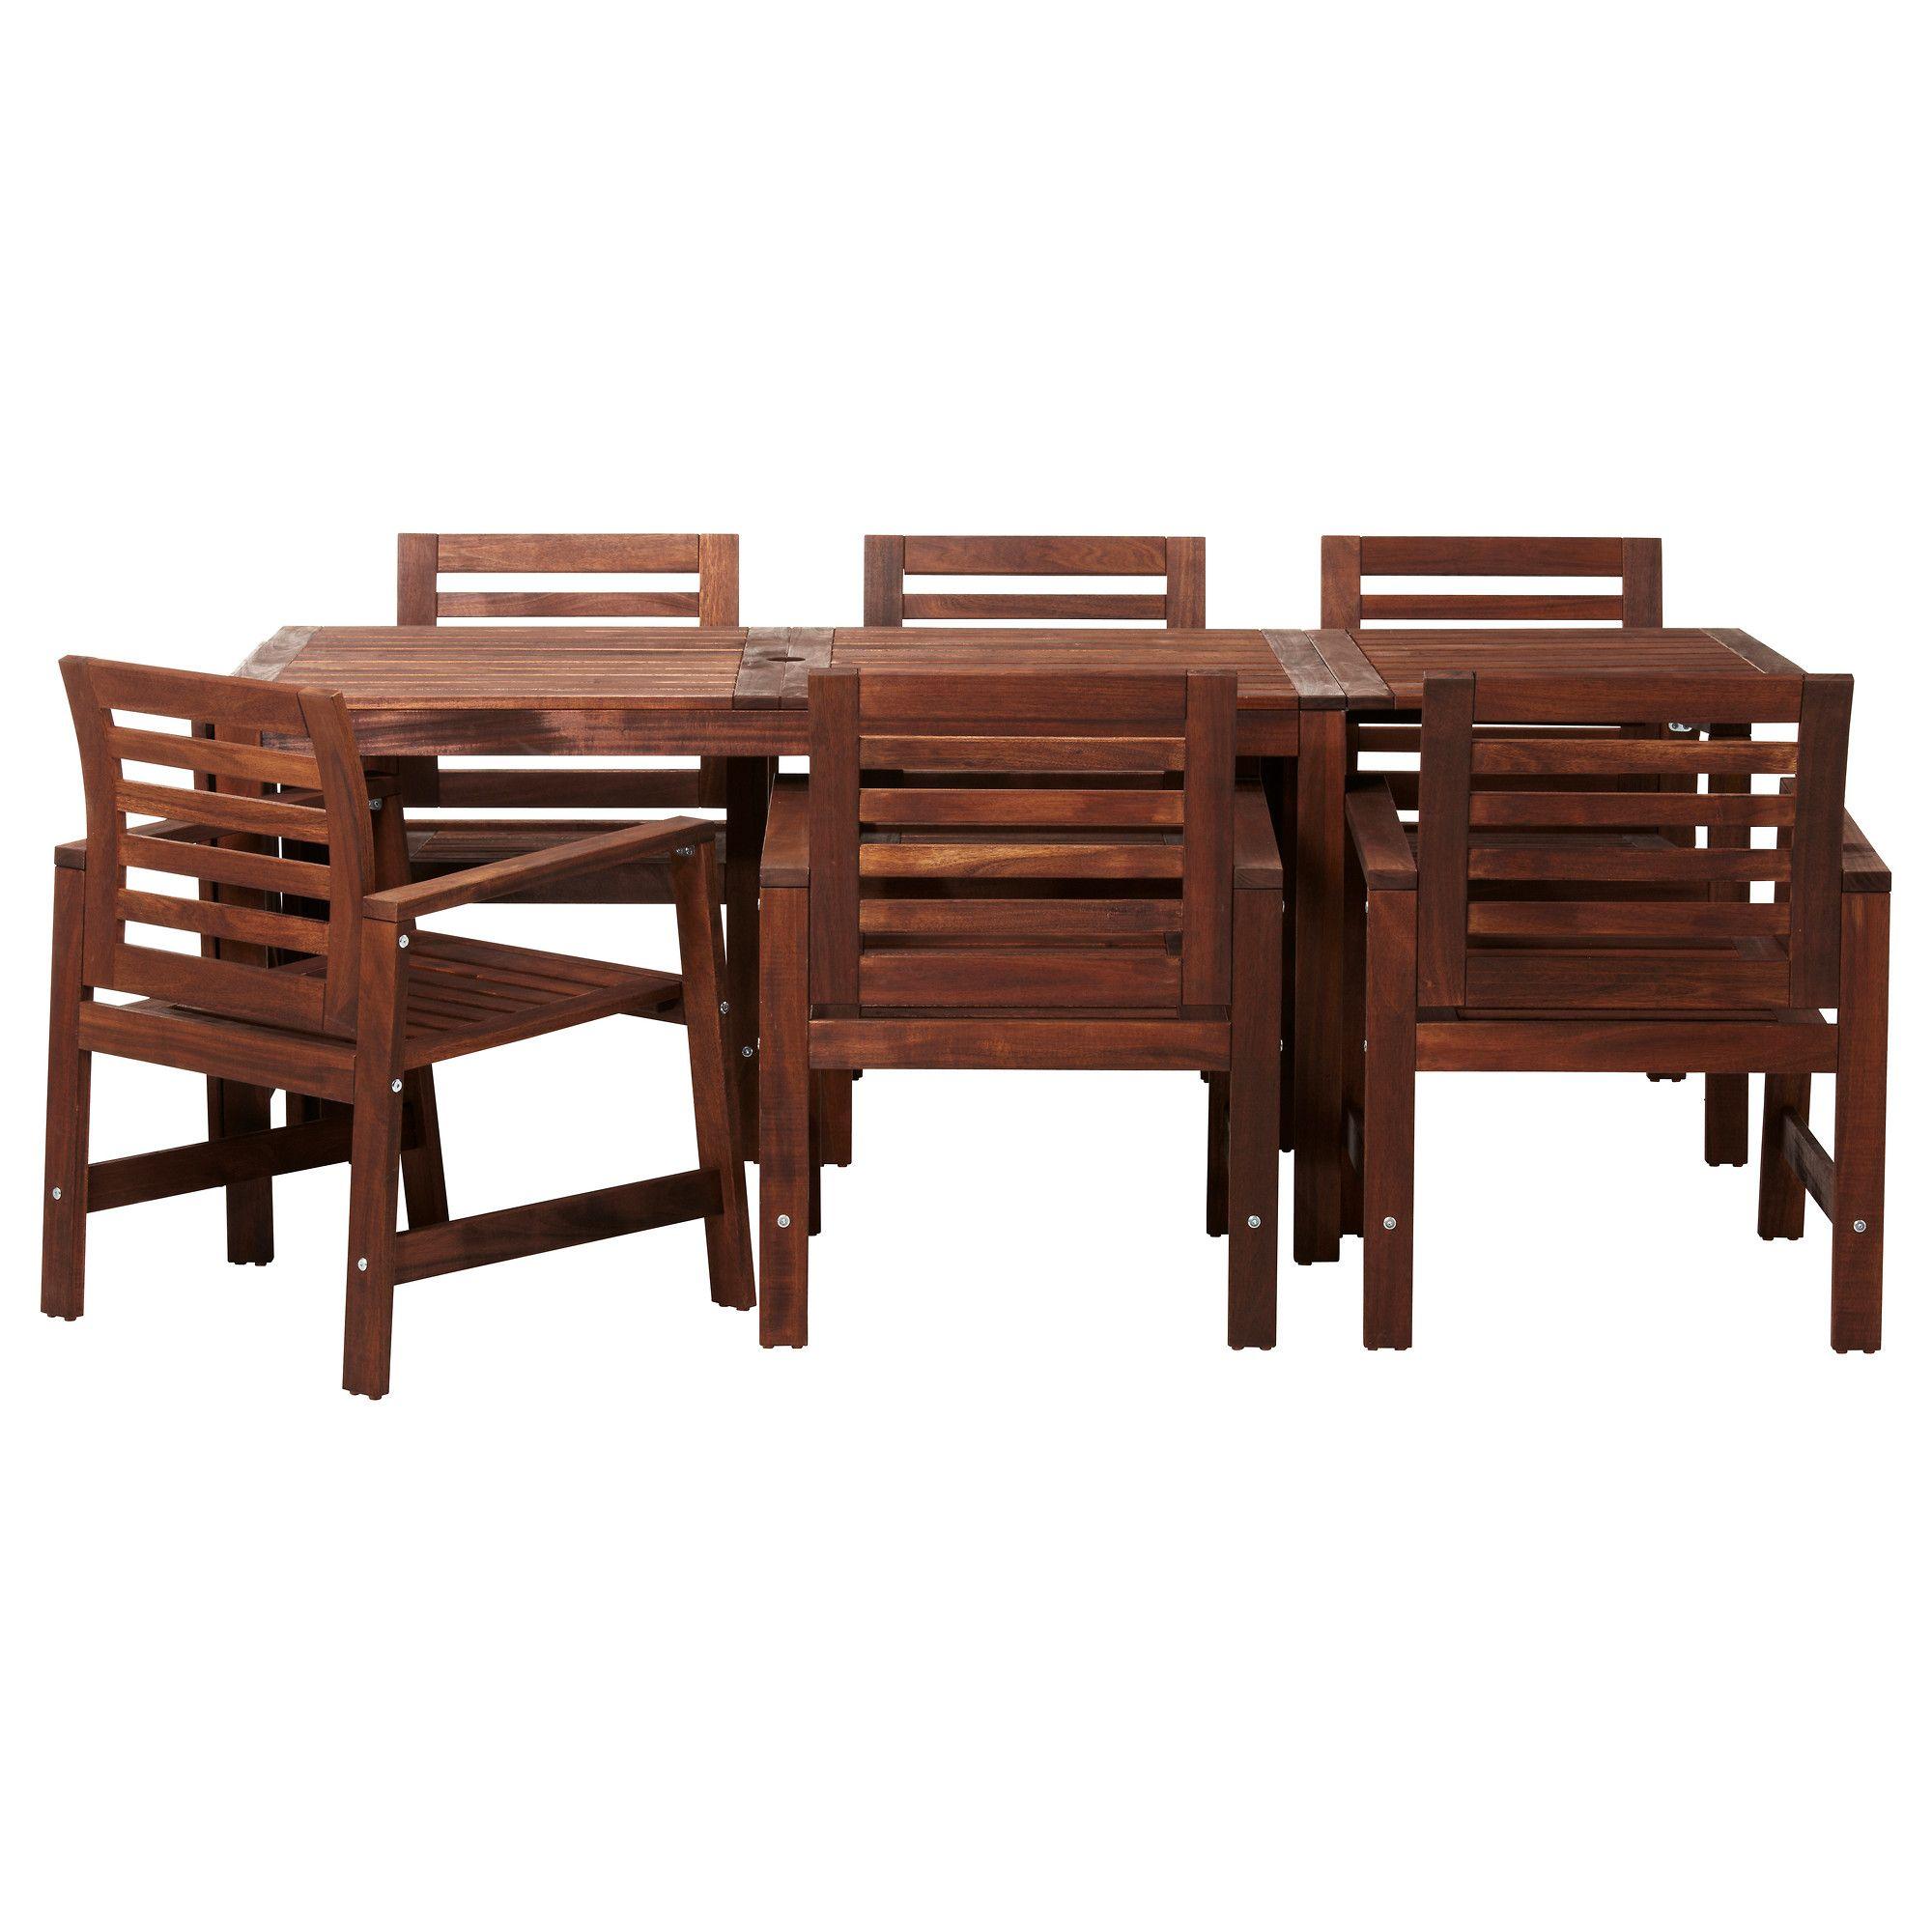 PPLAR Mesa y 6 sillas IKEA HOME TERRACE